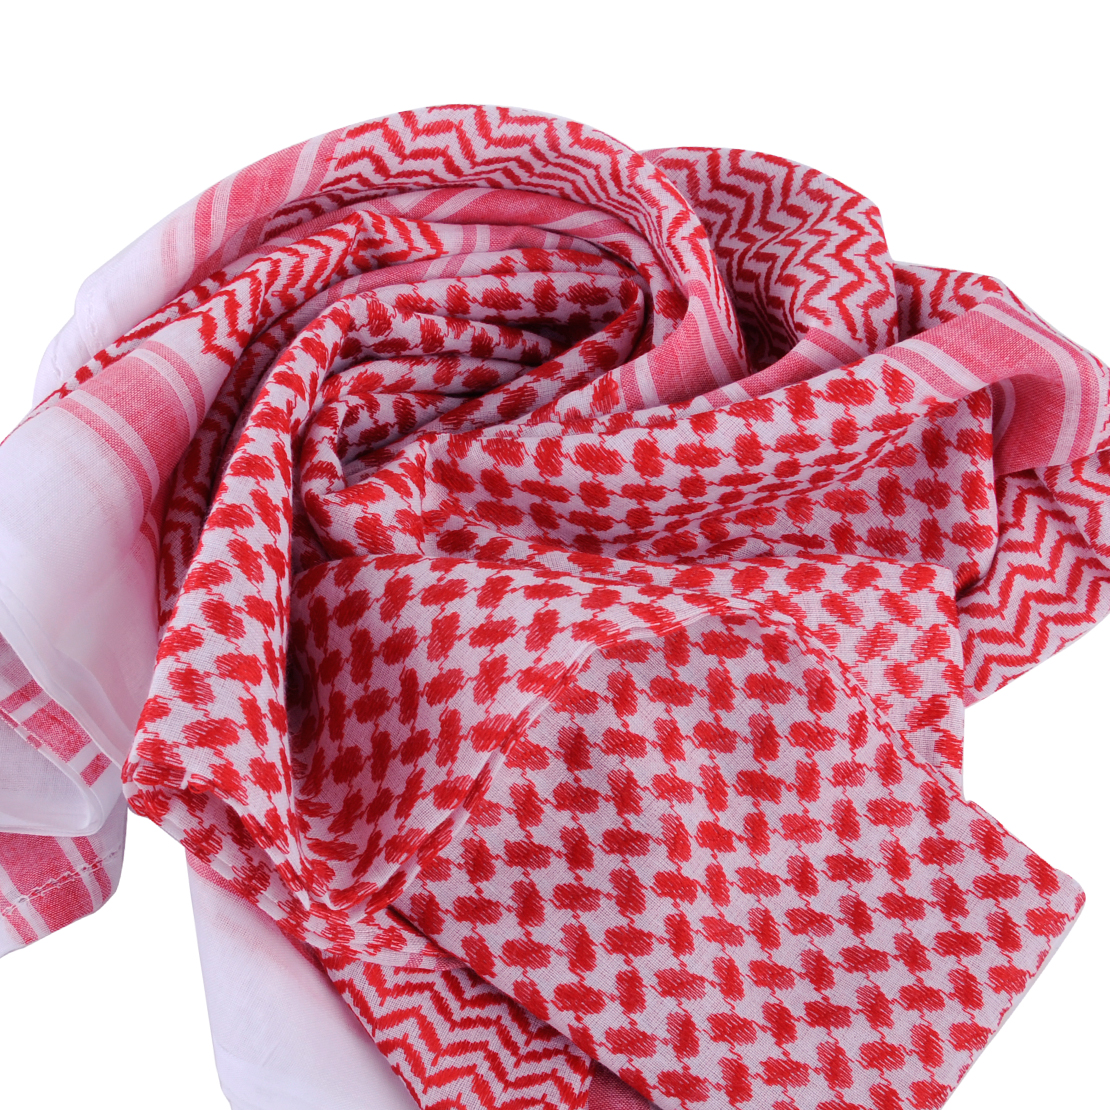 Muslim Islamic Kaffiyeh Arab Men Scarf Adultness Handsome Polyester New Headwear